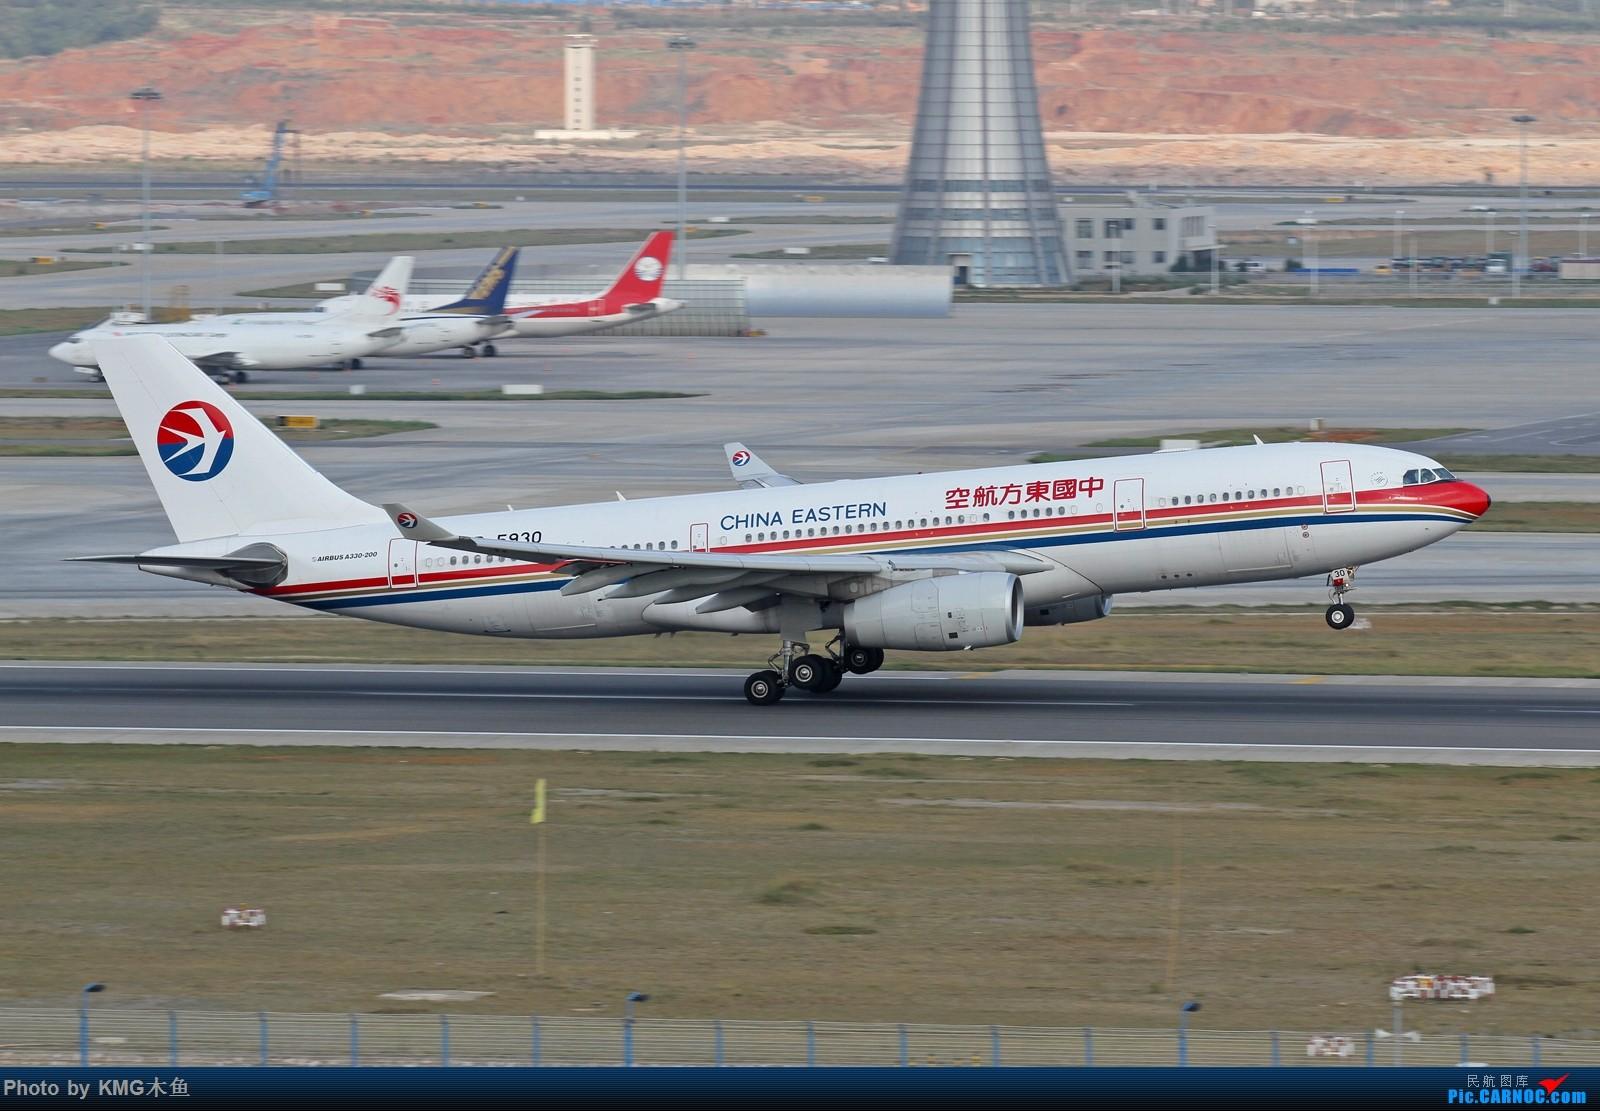 Re:[原创]【KMG】【昆明长水国际机场的东航330】东航云南高颜值的330,1600大图欣赏 AIRBUS A330-200 B-5930 中国昆明长水国际机场